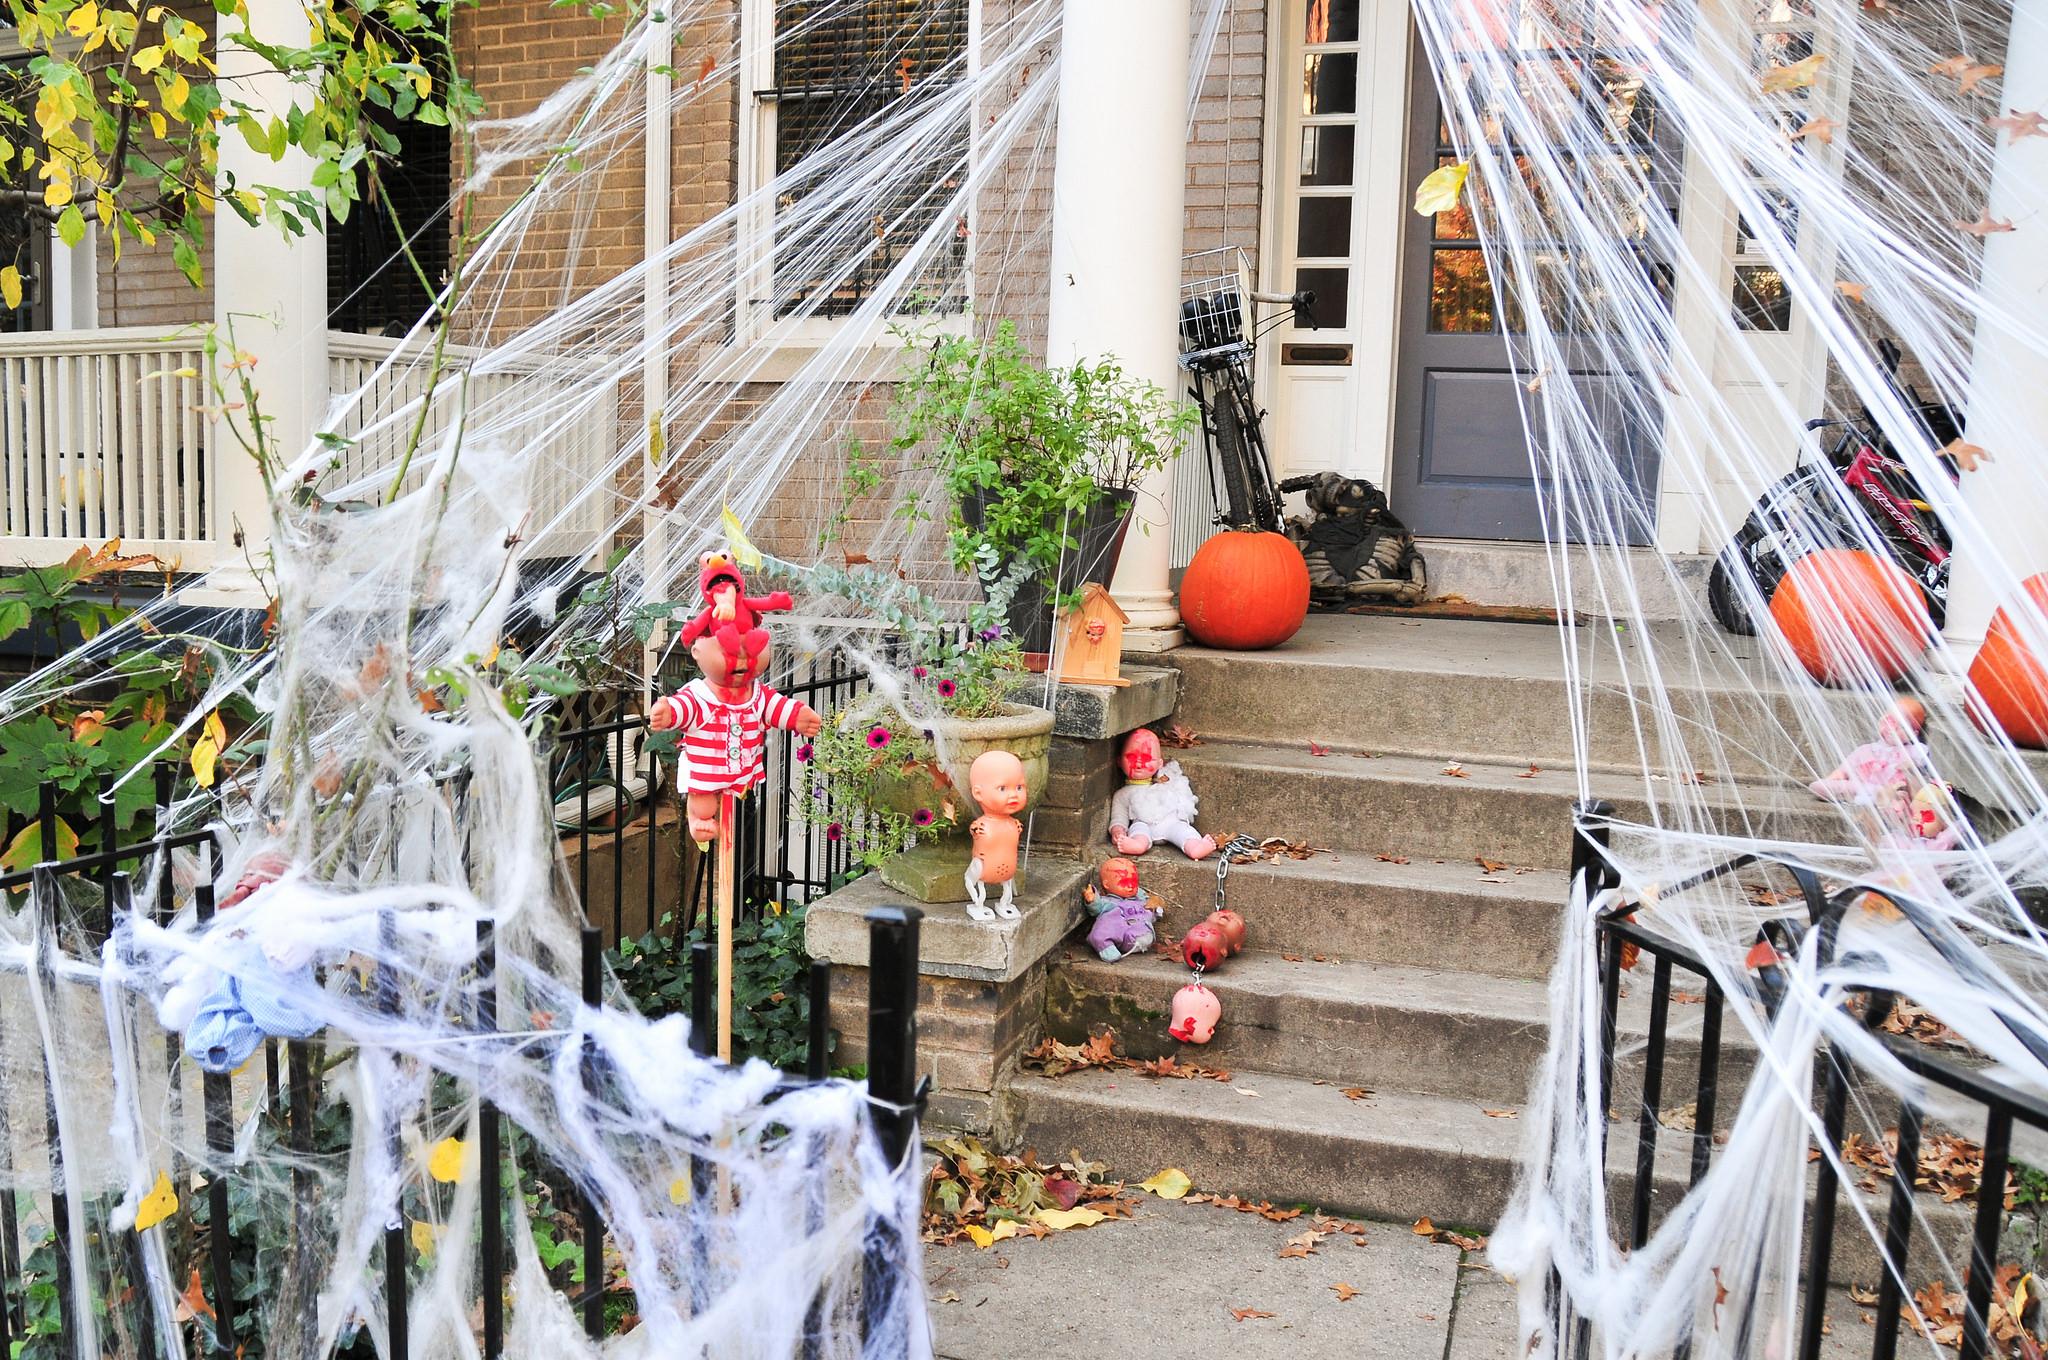 The Creepiest Halloween Display by John Leszczynski